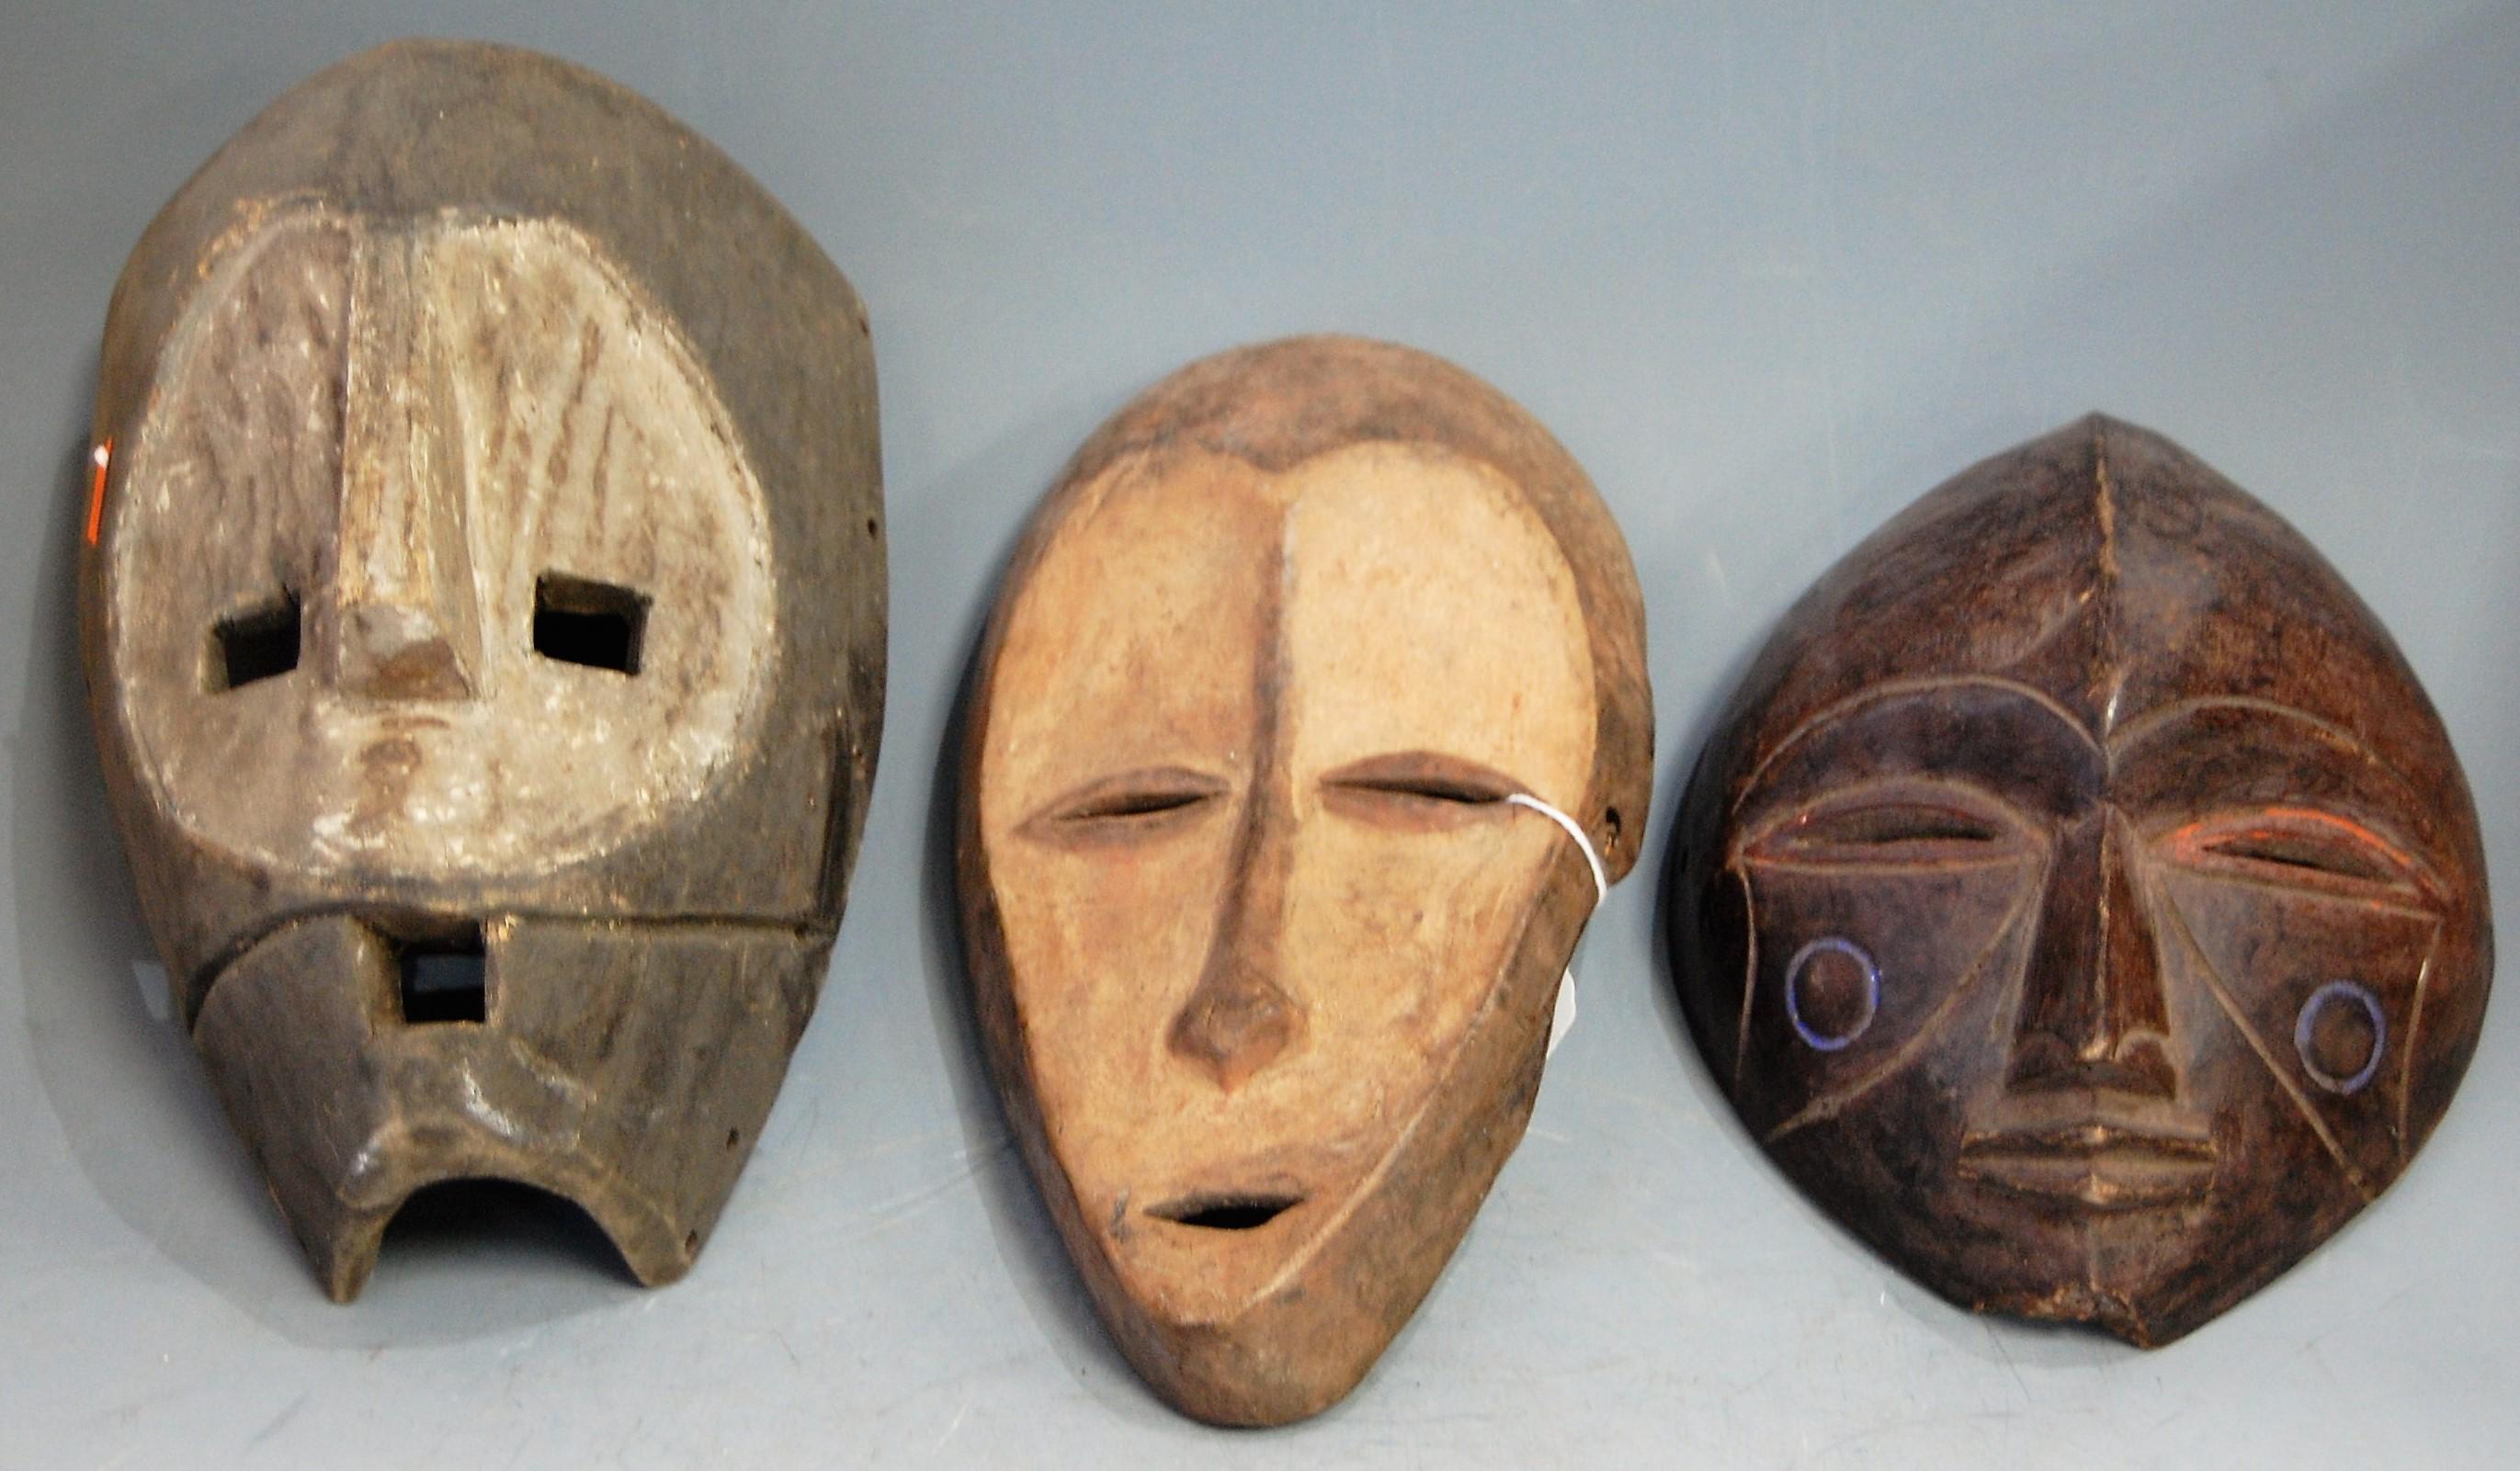 Lot 5 - Three mid-20th century African masks, to include Kumu (Democratic Republic of Congo), Lega (also